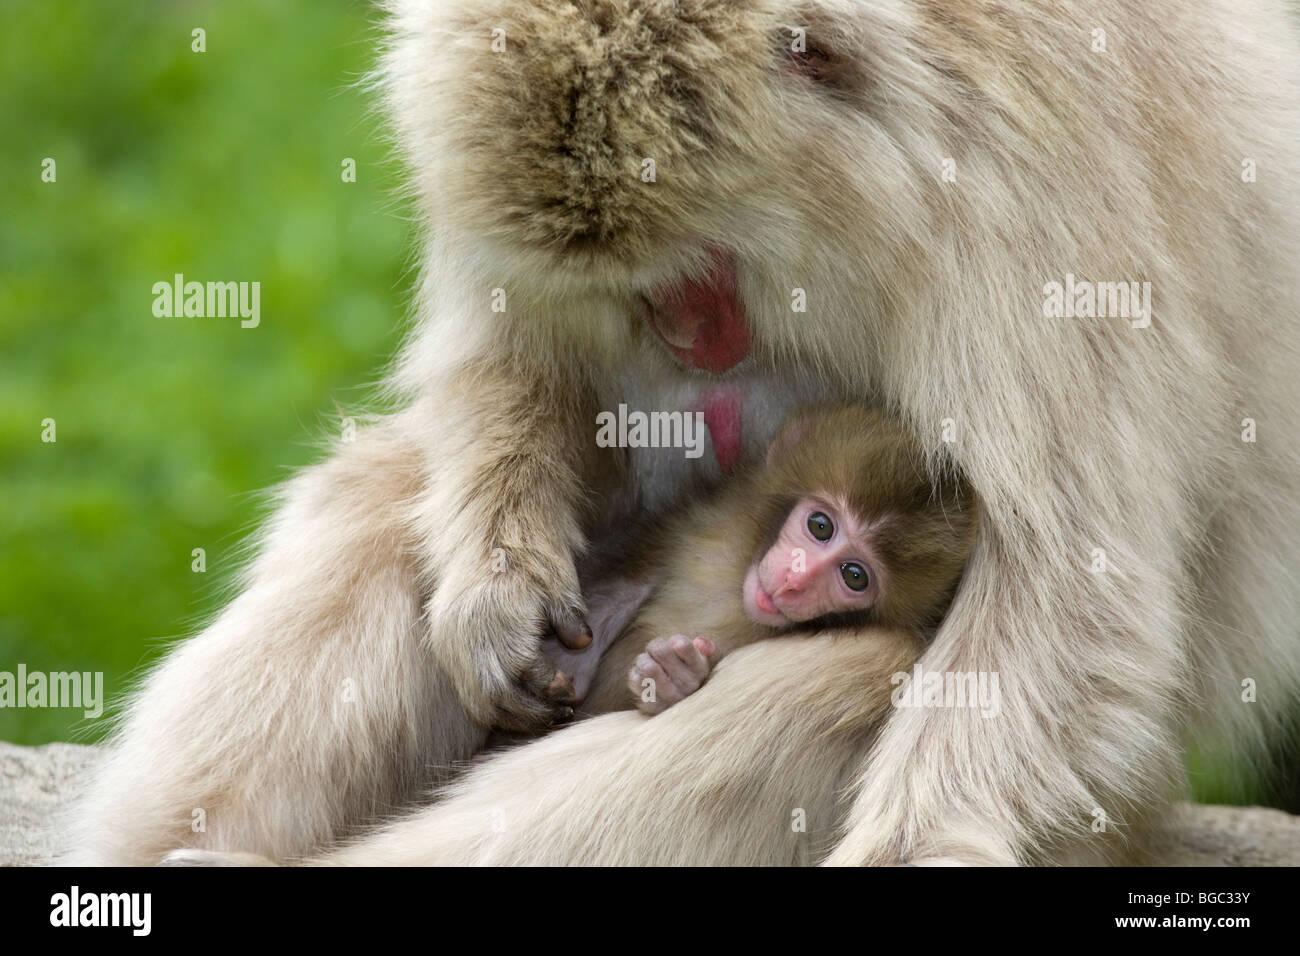 Japanischen Makaken (Macaca Fuscata) Mutter Pflege Baby Affe Stockbild